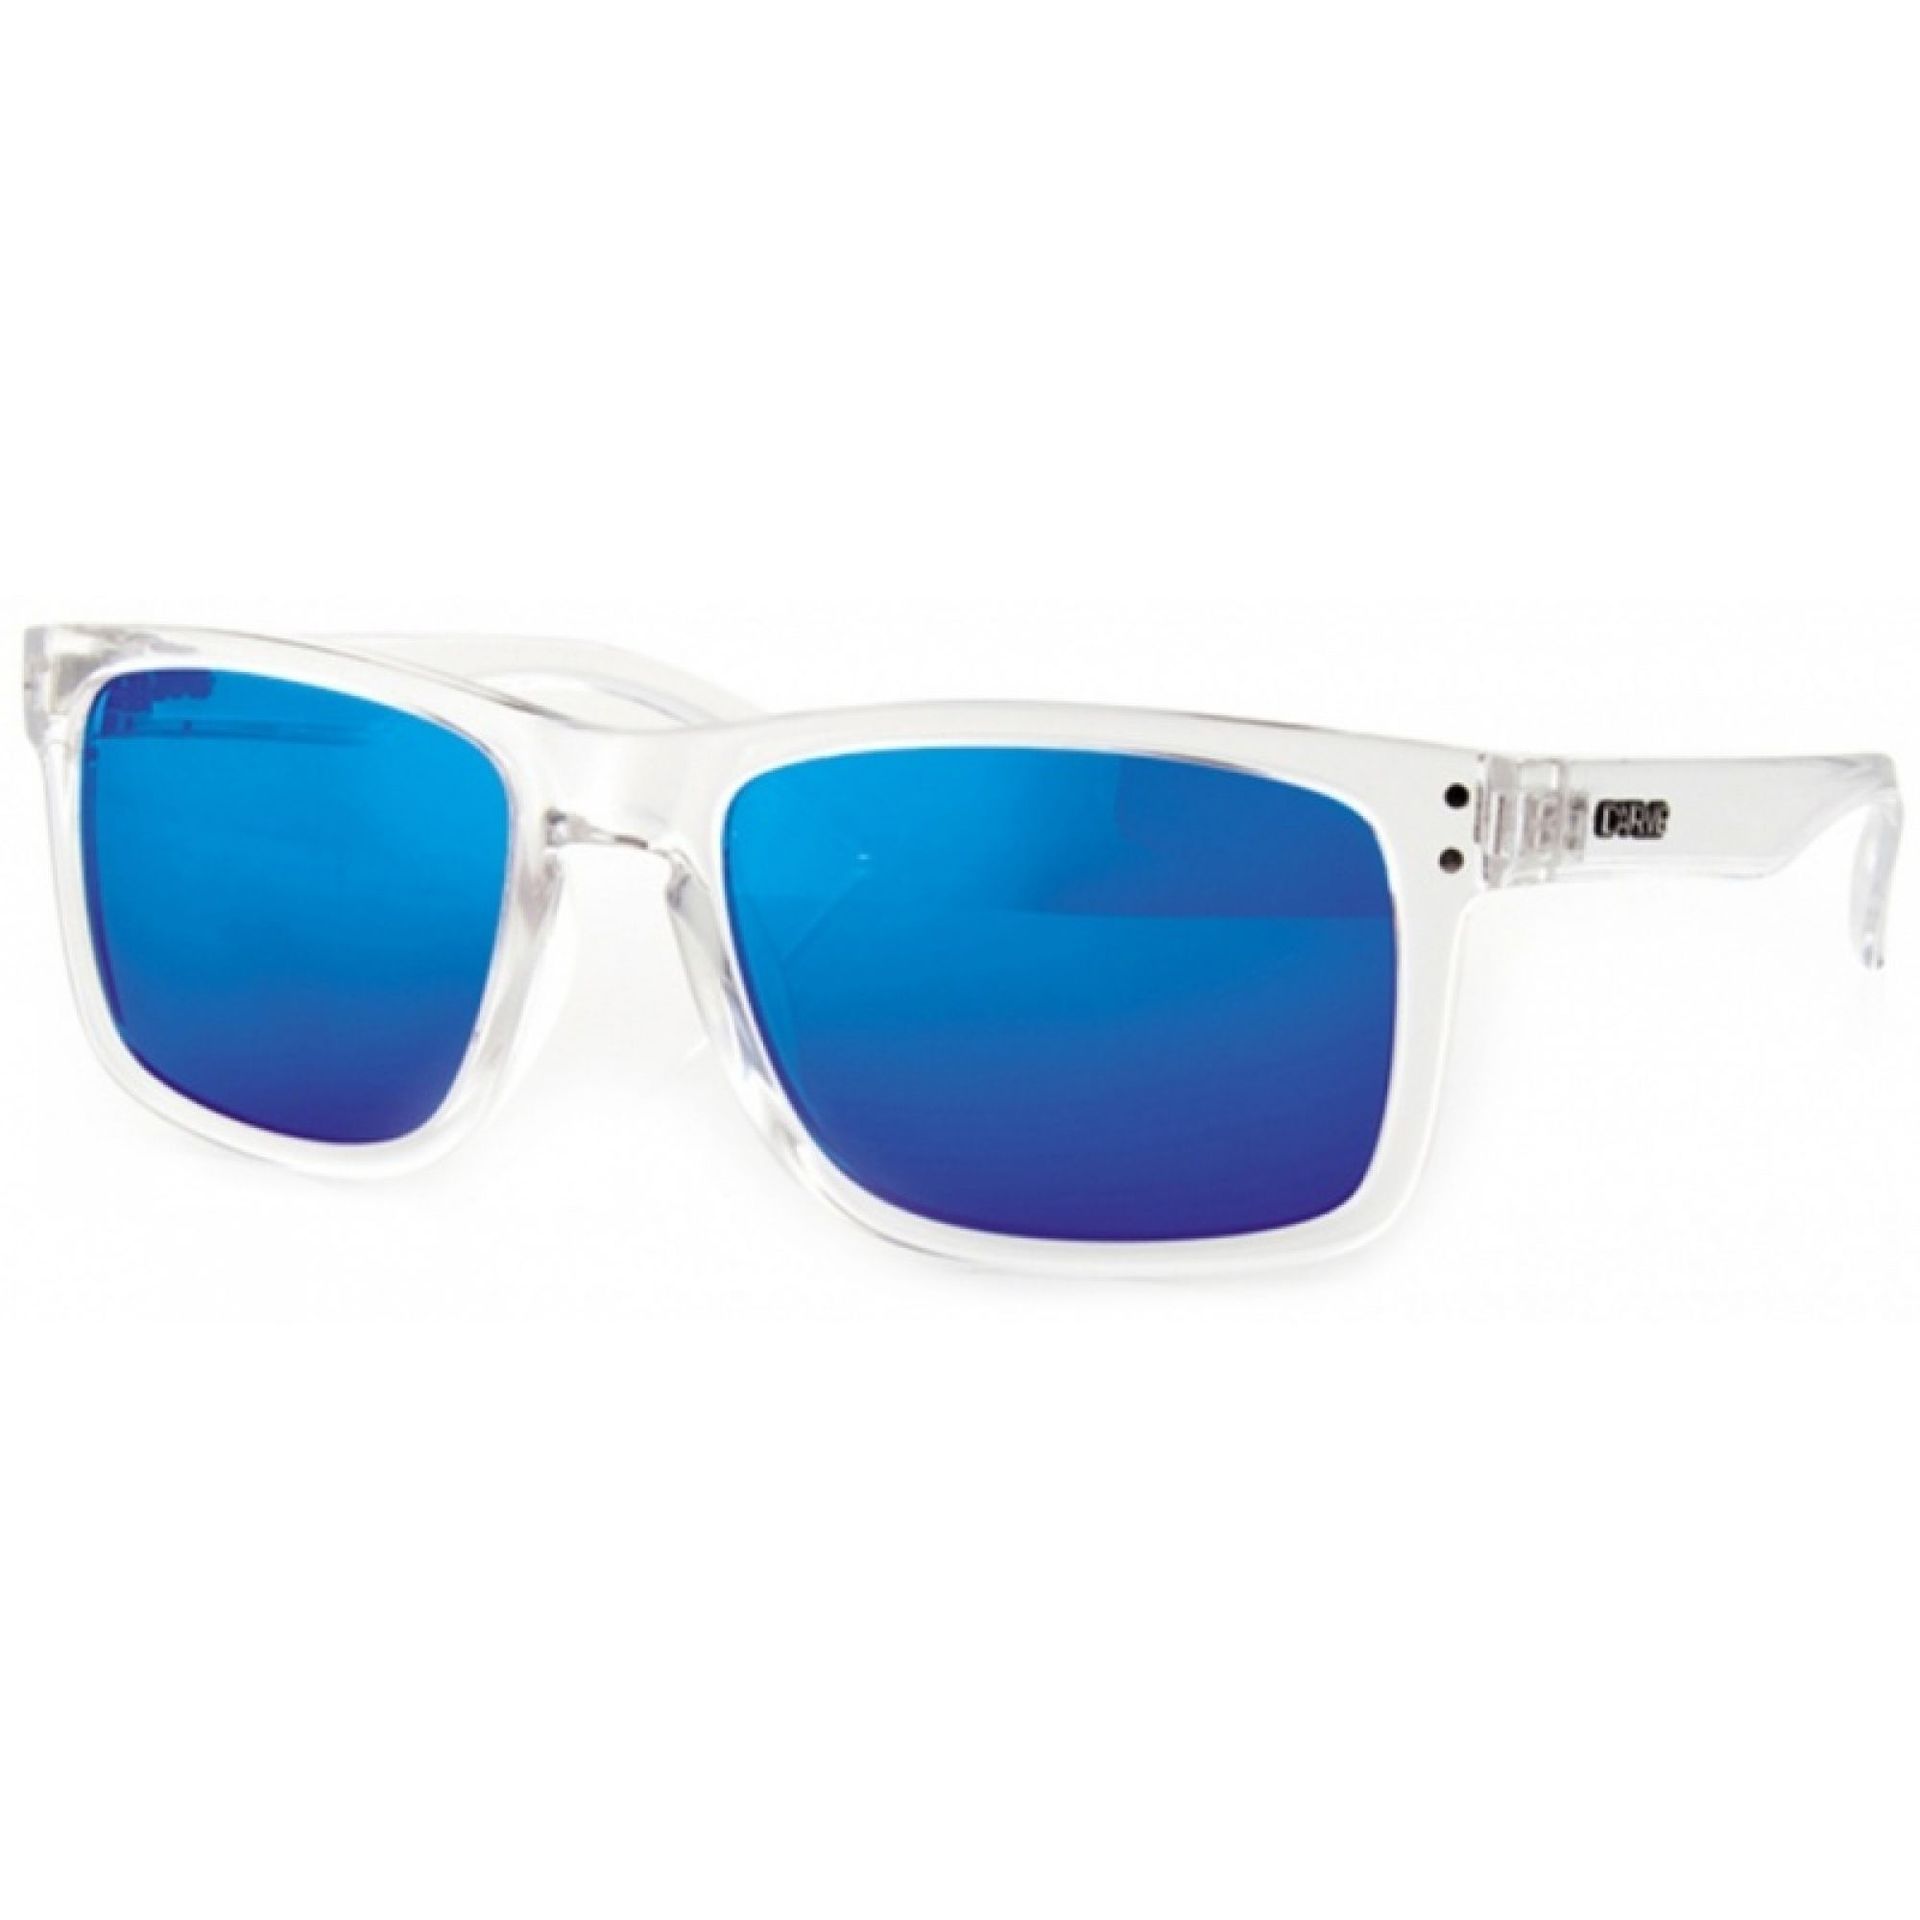 Okulary Carve Goblin clear blue revo